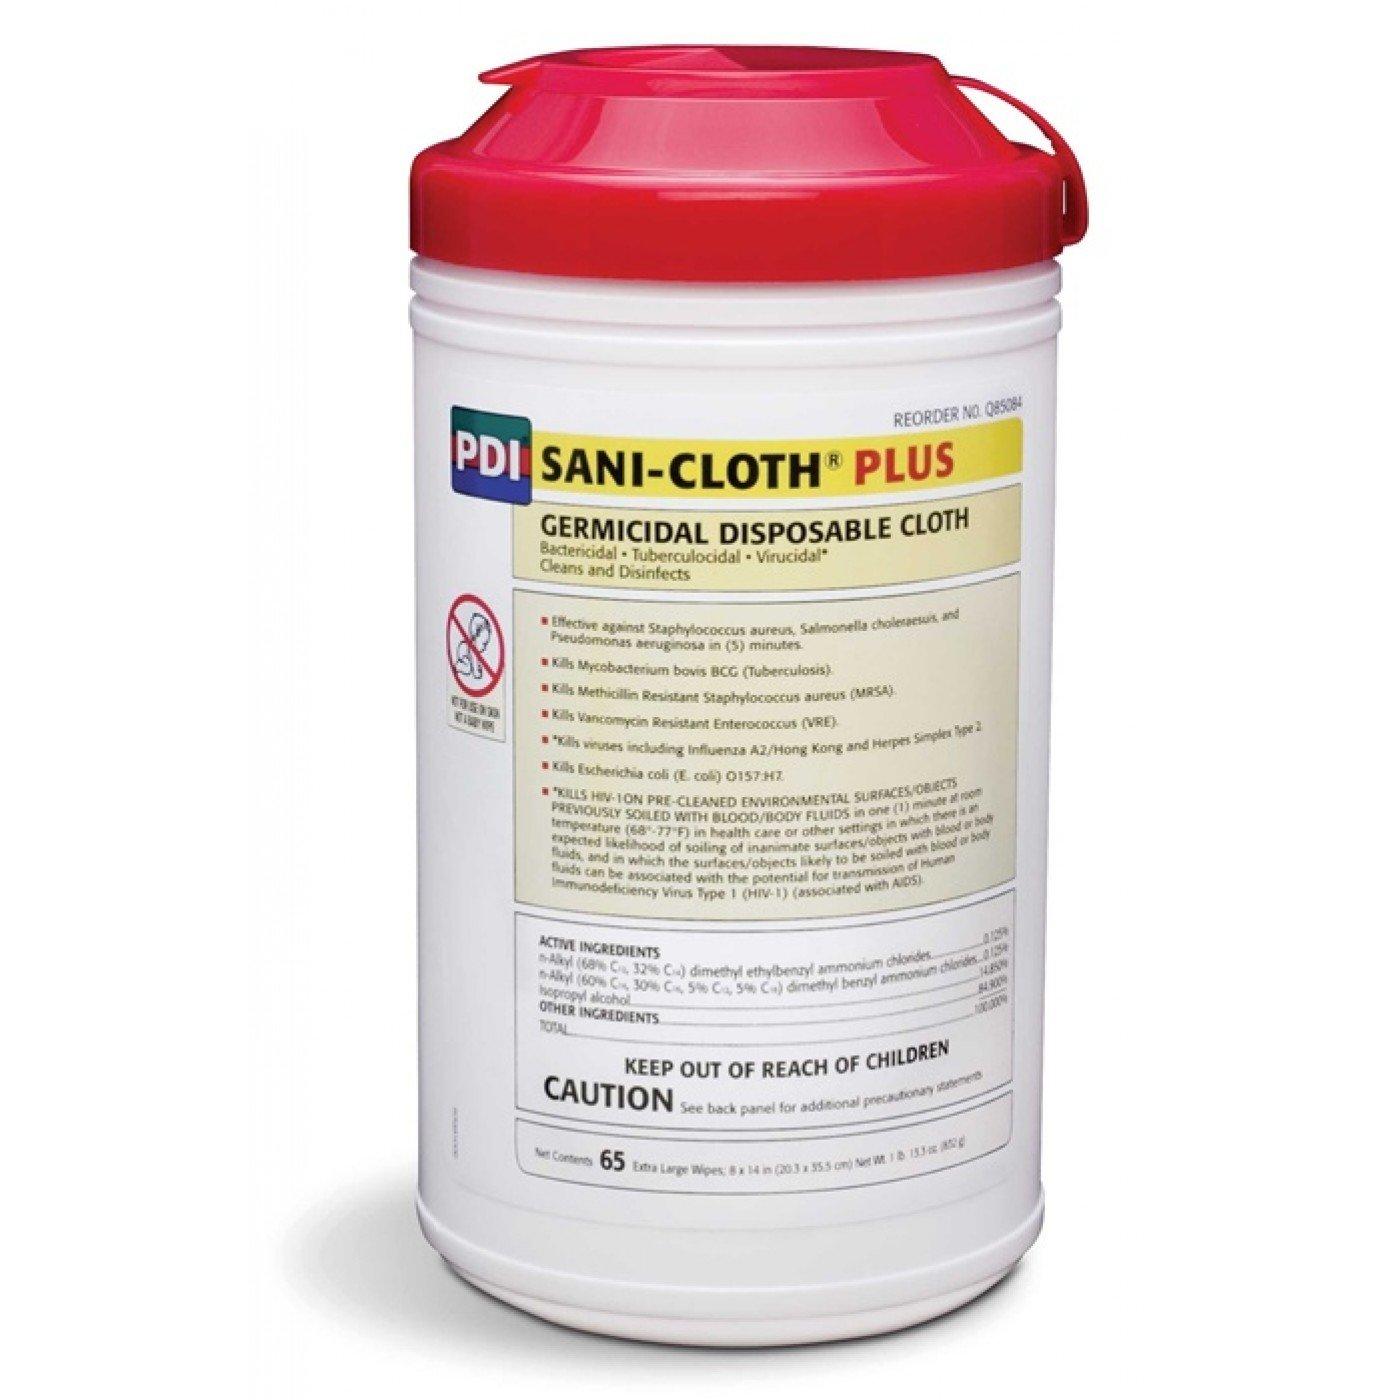 PYQ85084 - Sani-cloth Plus Germicidal Disposable Wipes 8 x 14 Large